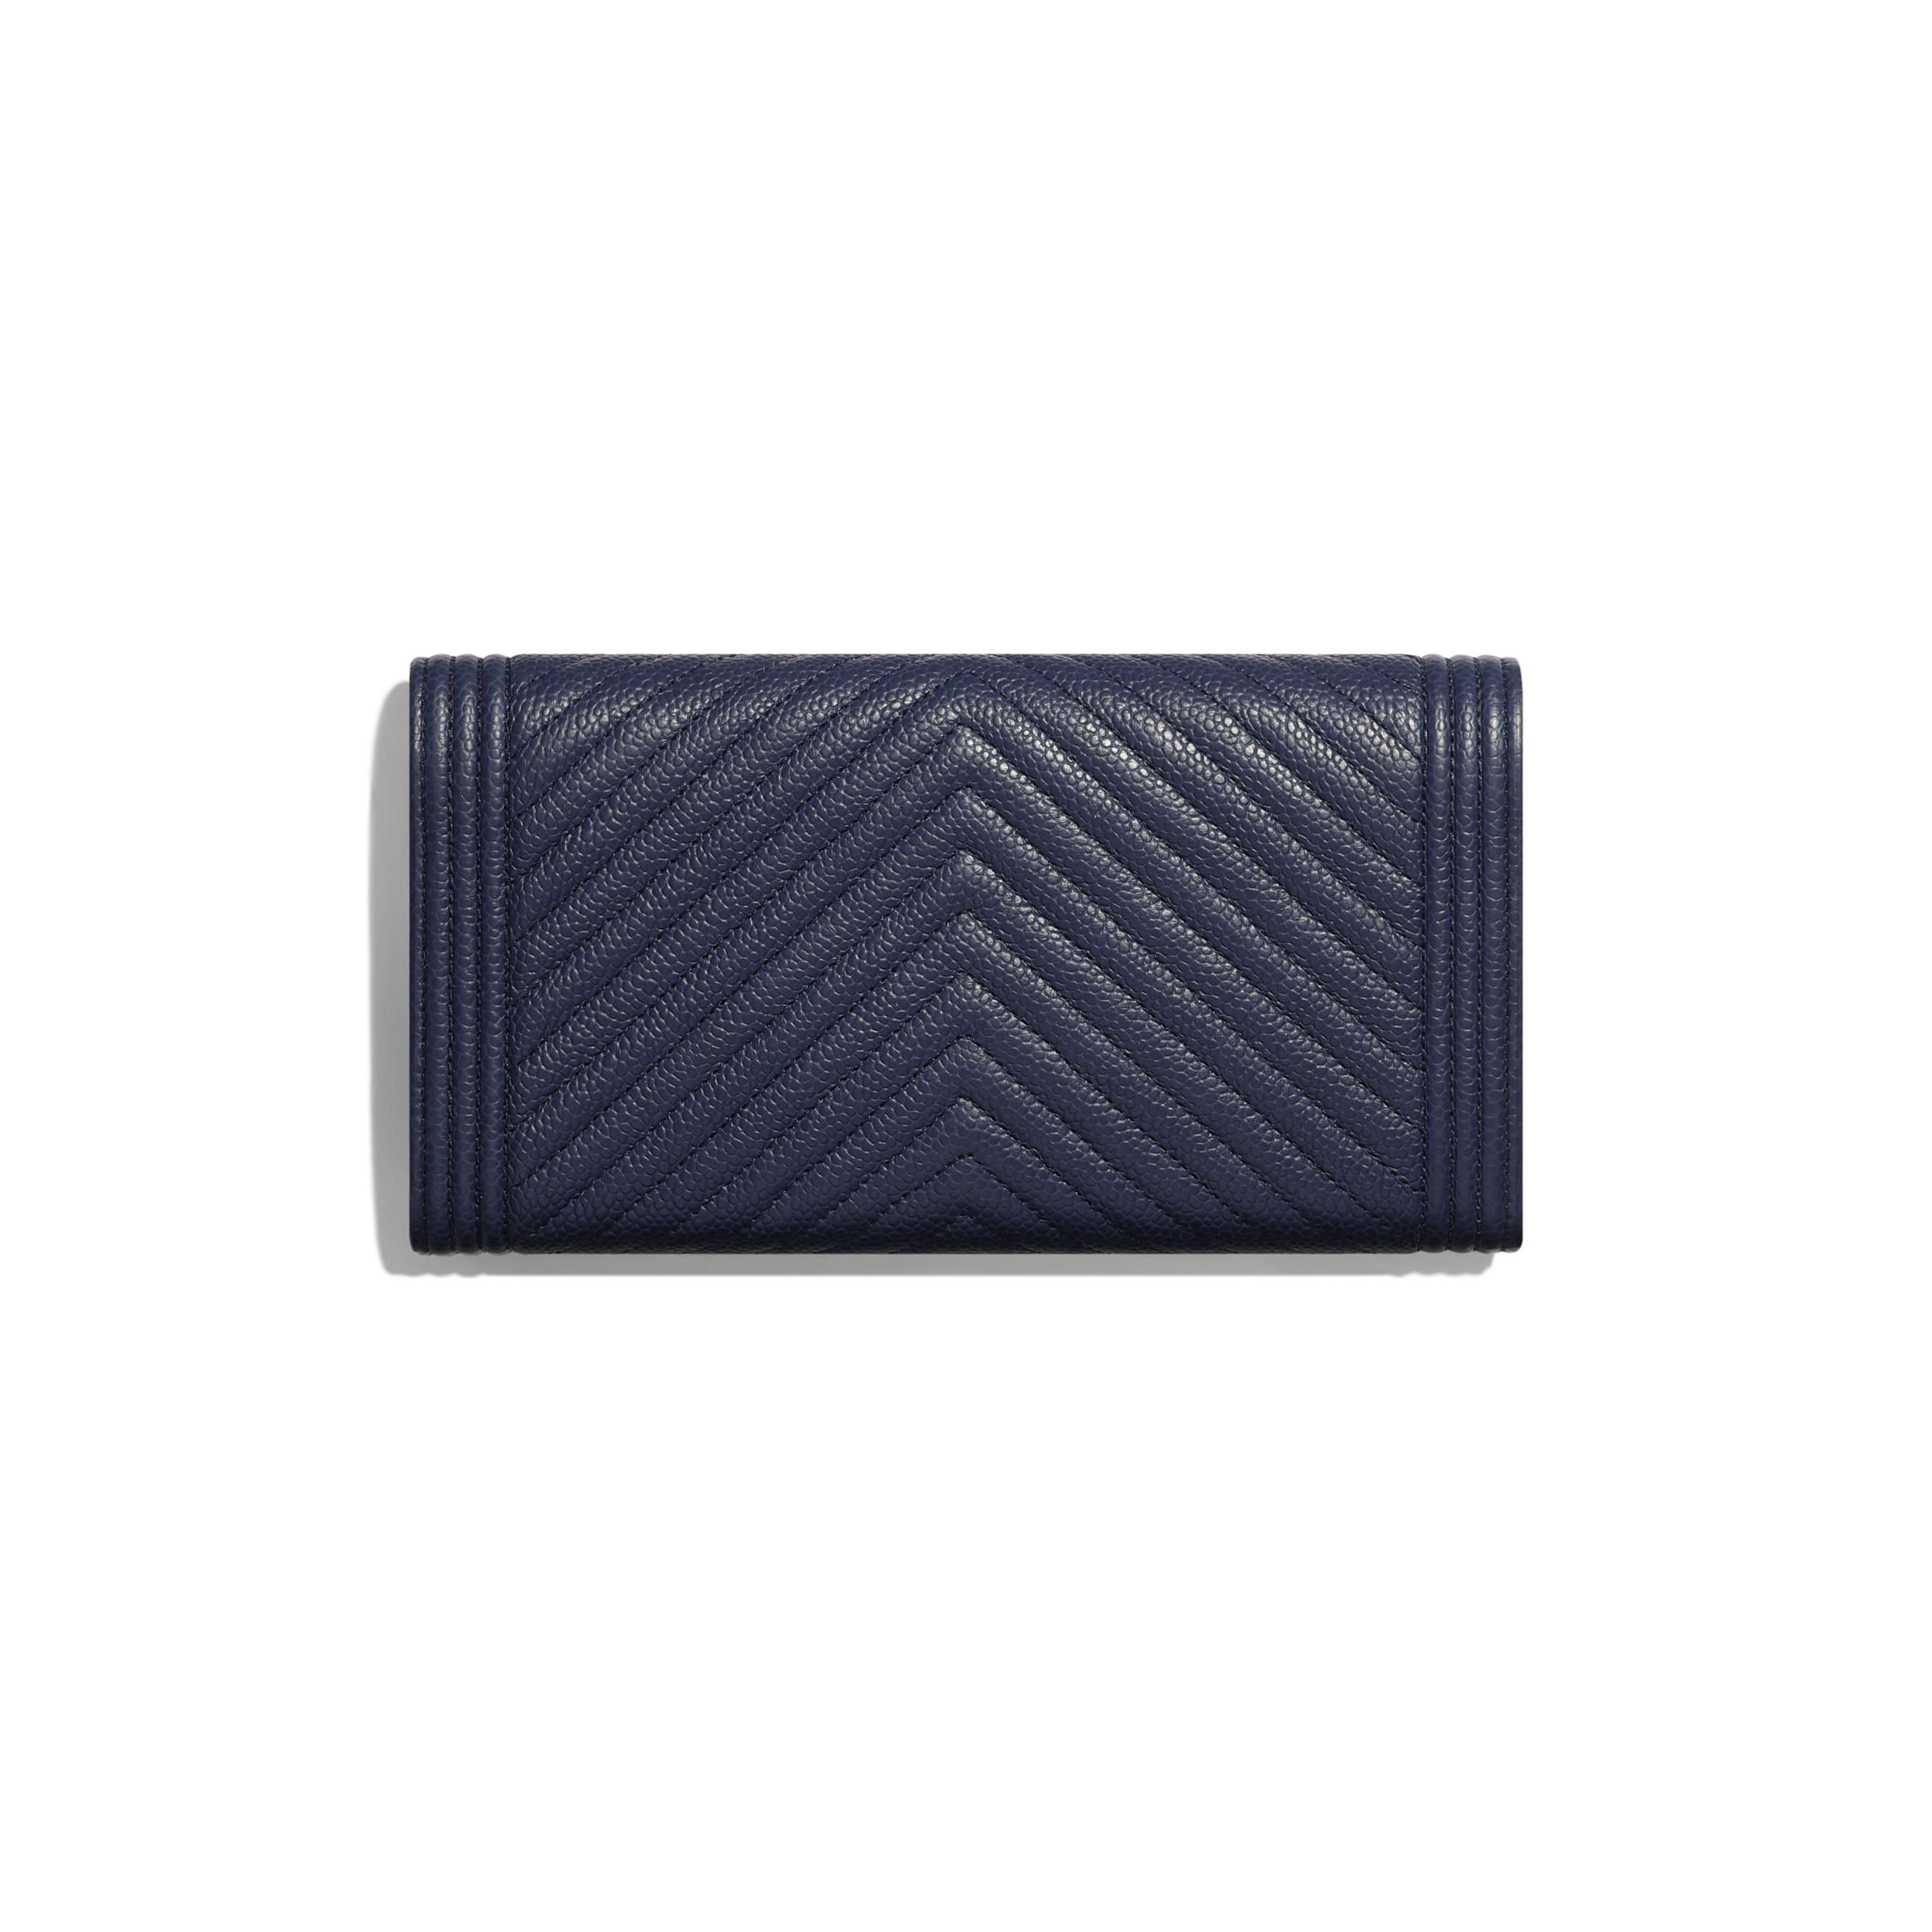 BOY CHANEL Long Flap Wallet - Navy Blue - Grained Calfskin & Ruthenium-Finish Metal - Alternative view - see standard sized version